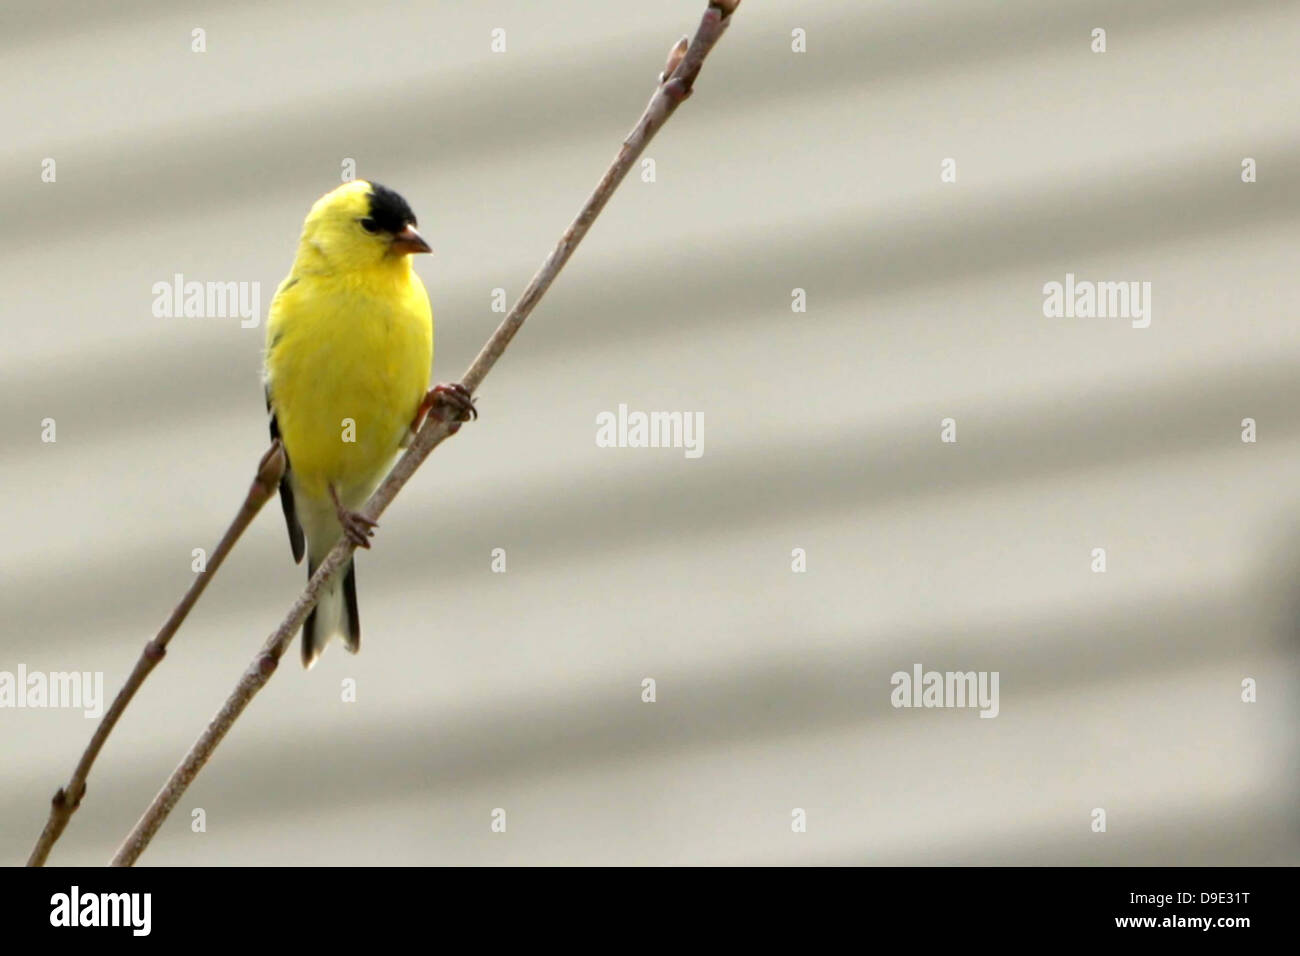 YELLOW BLACK BIRD SITTING ON STICK BRANCH TWIG - Stock Image